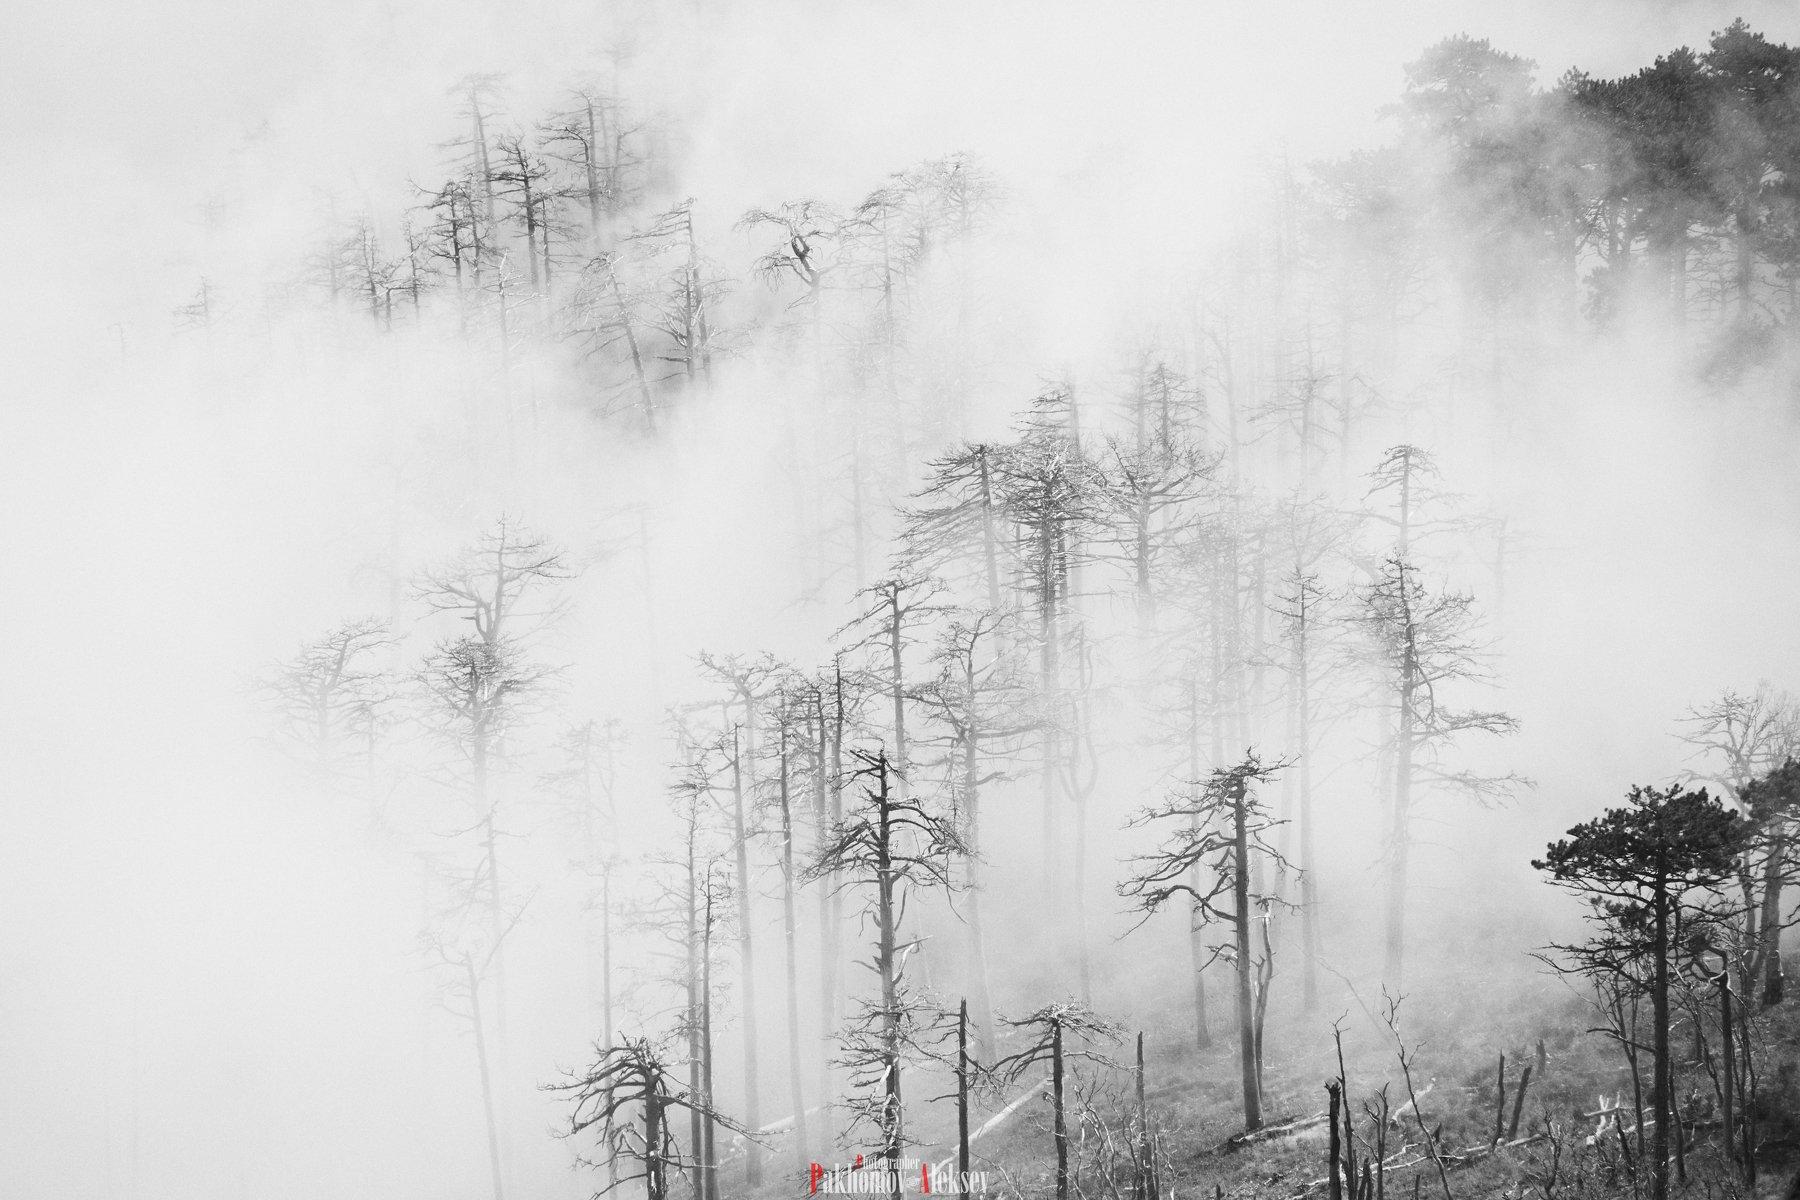 monochrome, black, white, bw, b&w, blackwhite, black&white, landscape, mystery, three, fog, russia, crimea, чб, монохром, пейзаж, деревья, туман, природа, nature, outdoor, Pakhomov Aleksey